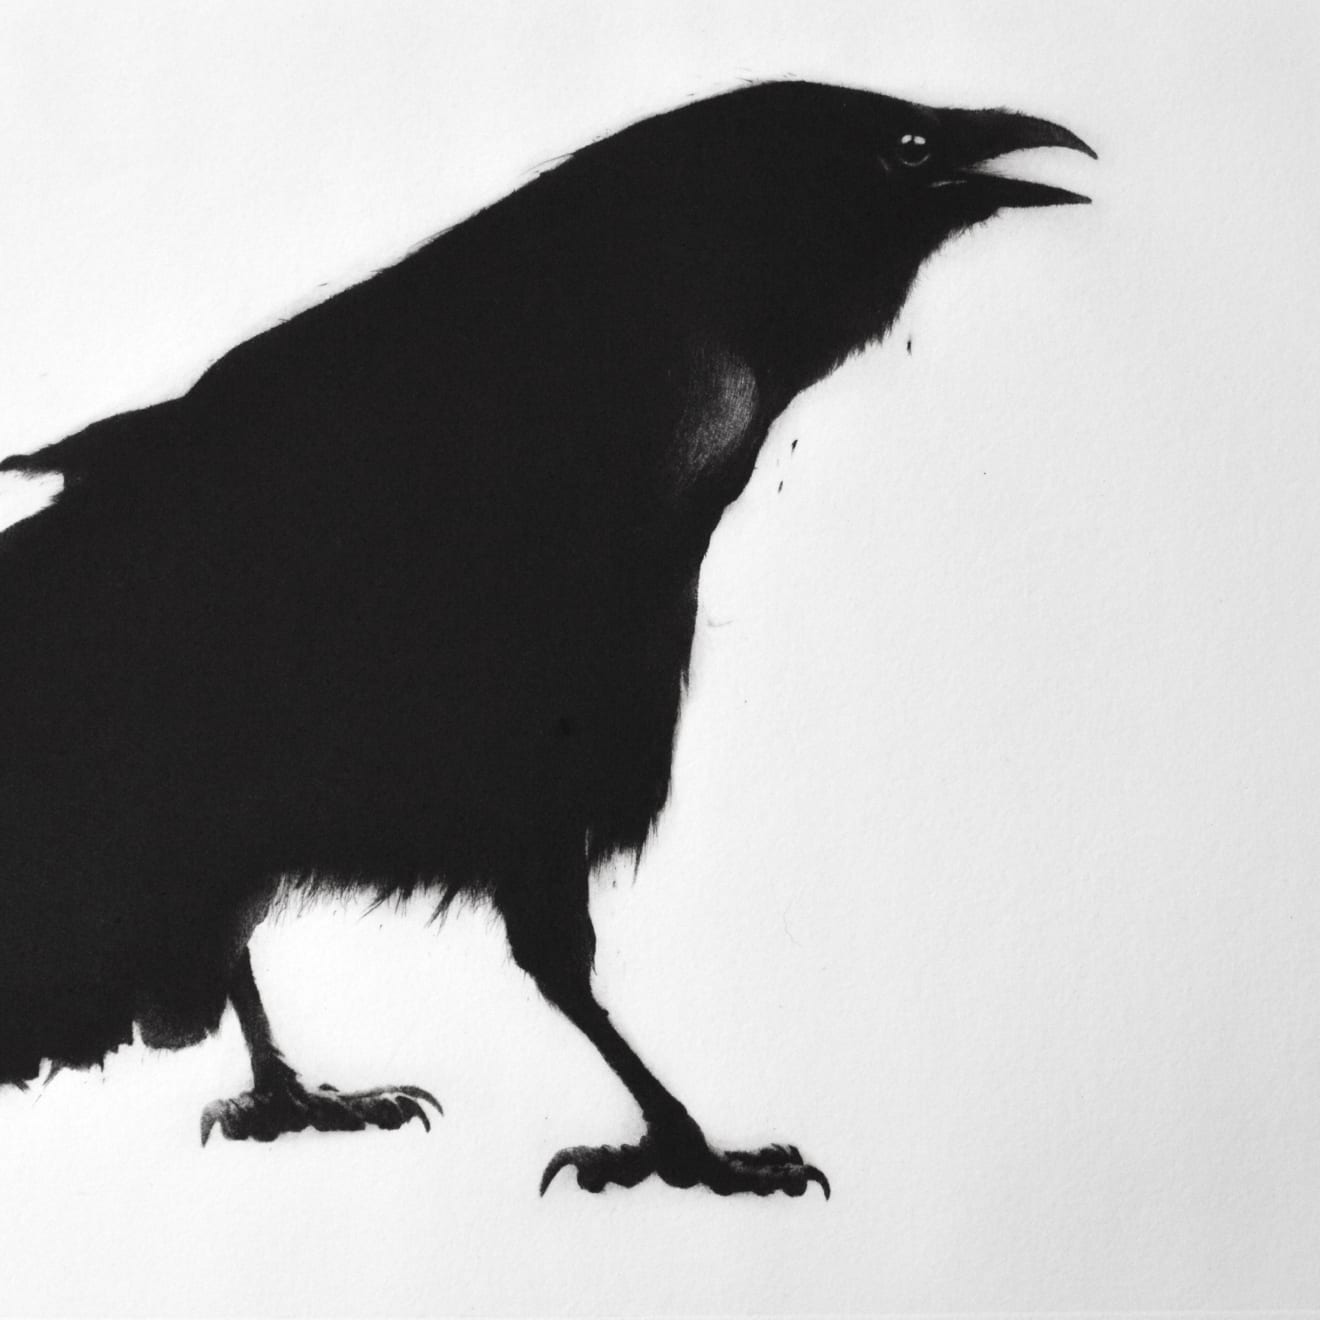 Summer Auction 2020, LOT 66 - Sarah Gillespie - 'Crow', 2020